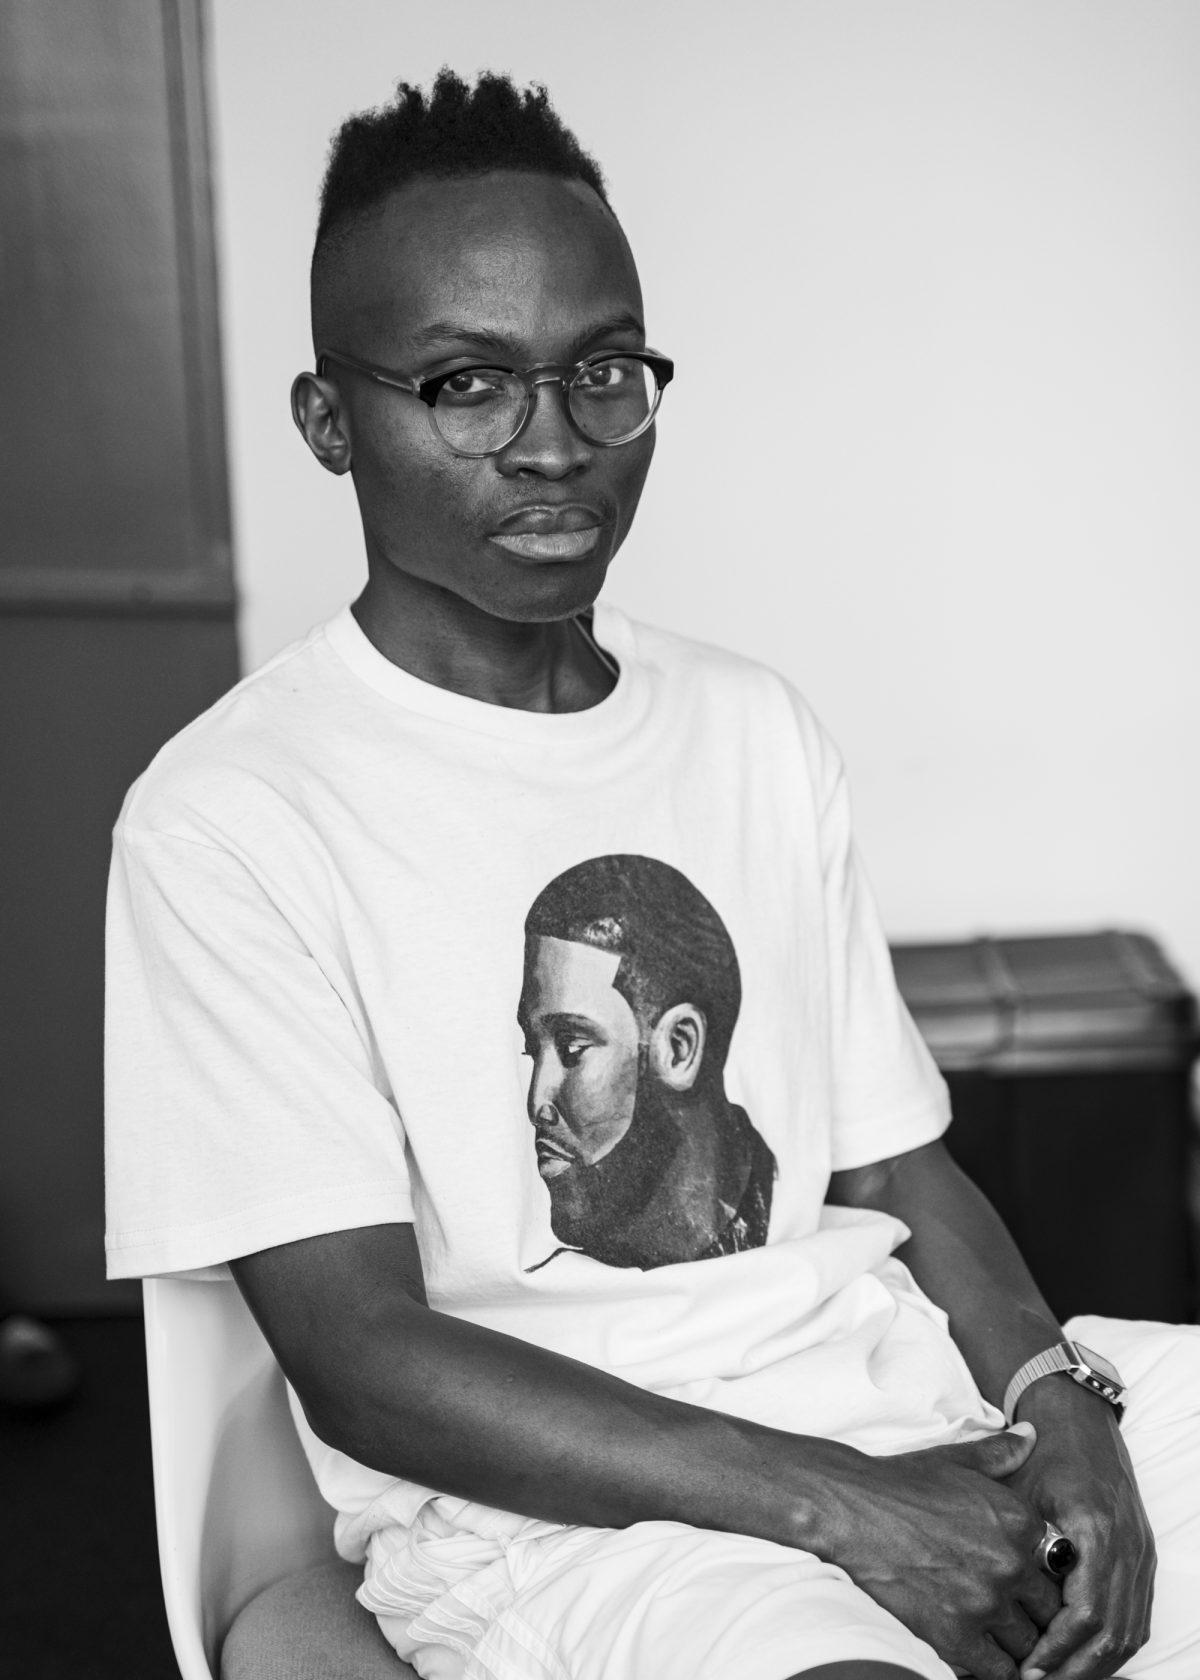 Constitution Hill: Jamal Nxedlana, Co-founder & Creative Director at Bubblegum Club